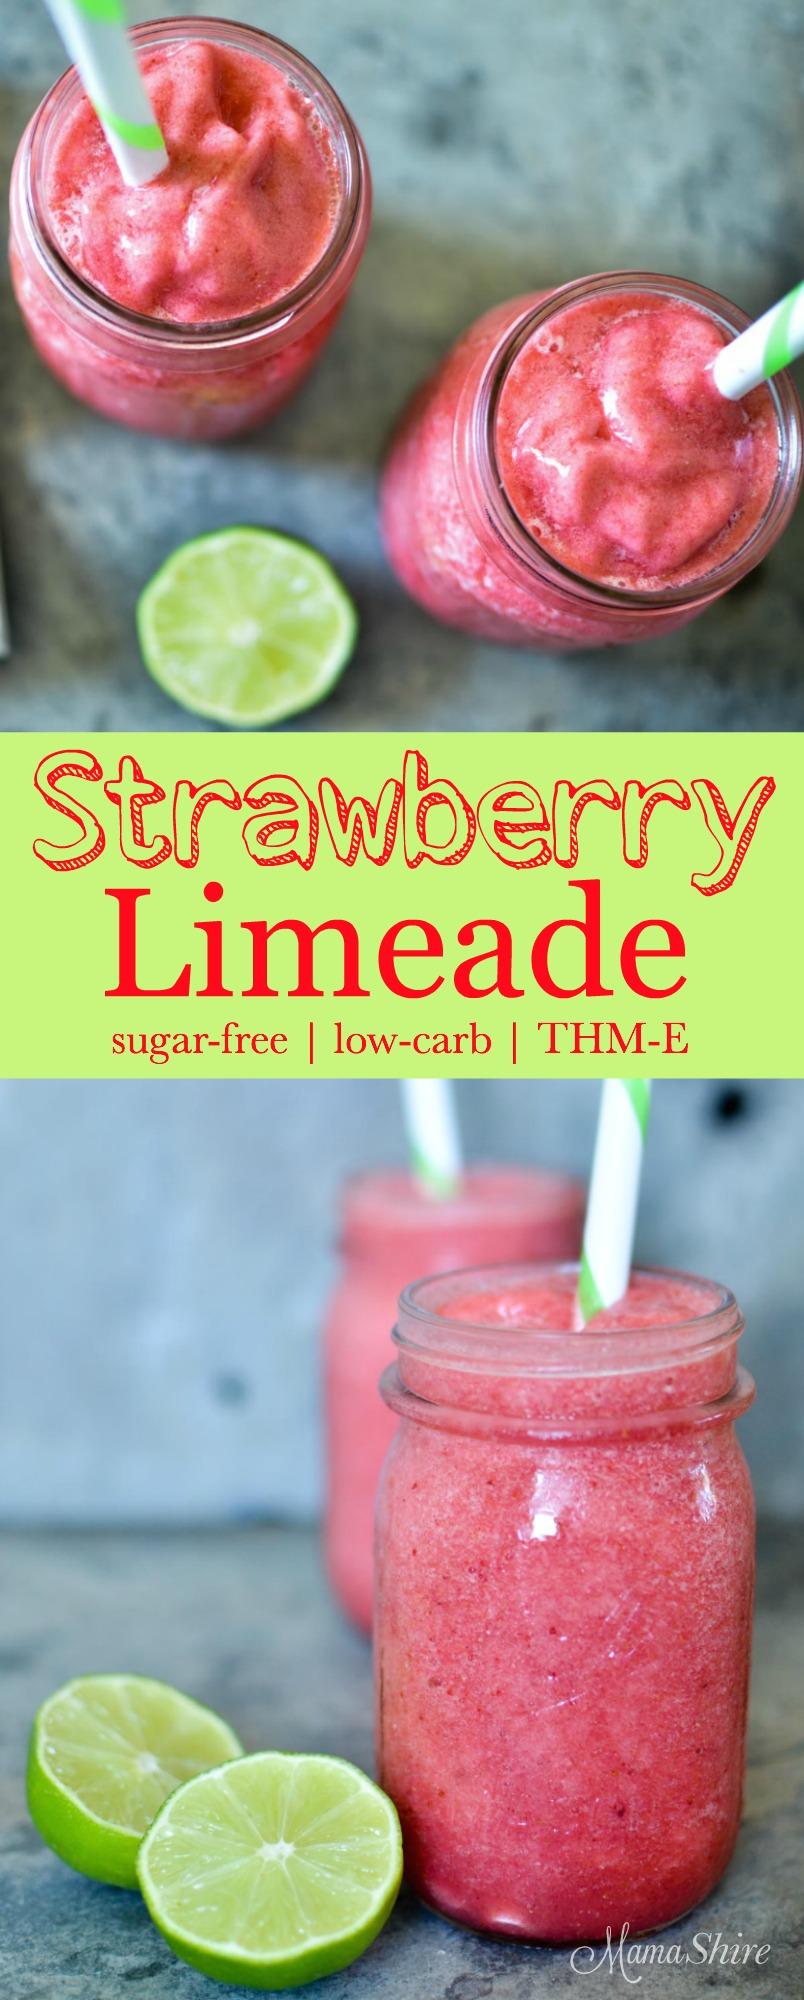 Heatlhy Strawberry Limeade - Sugar-free, low-carb, THM-E